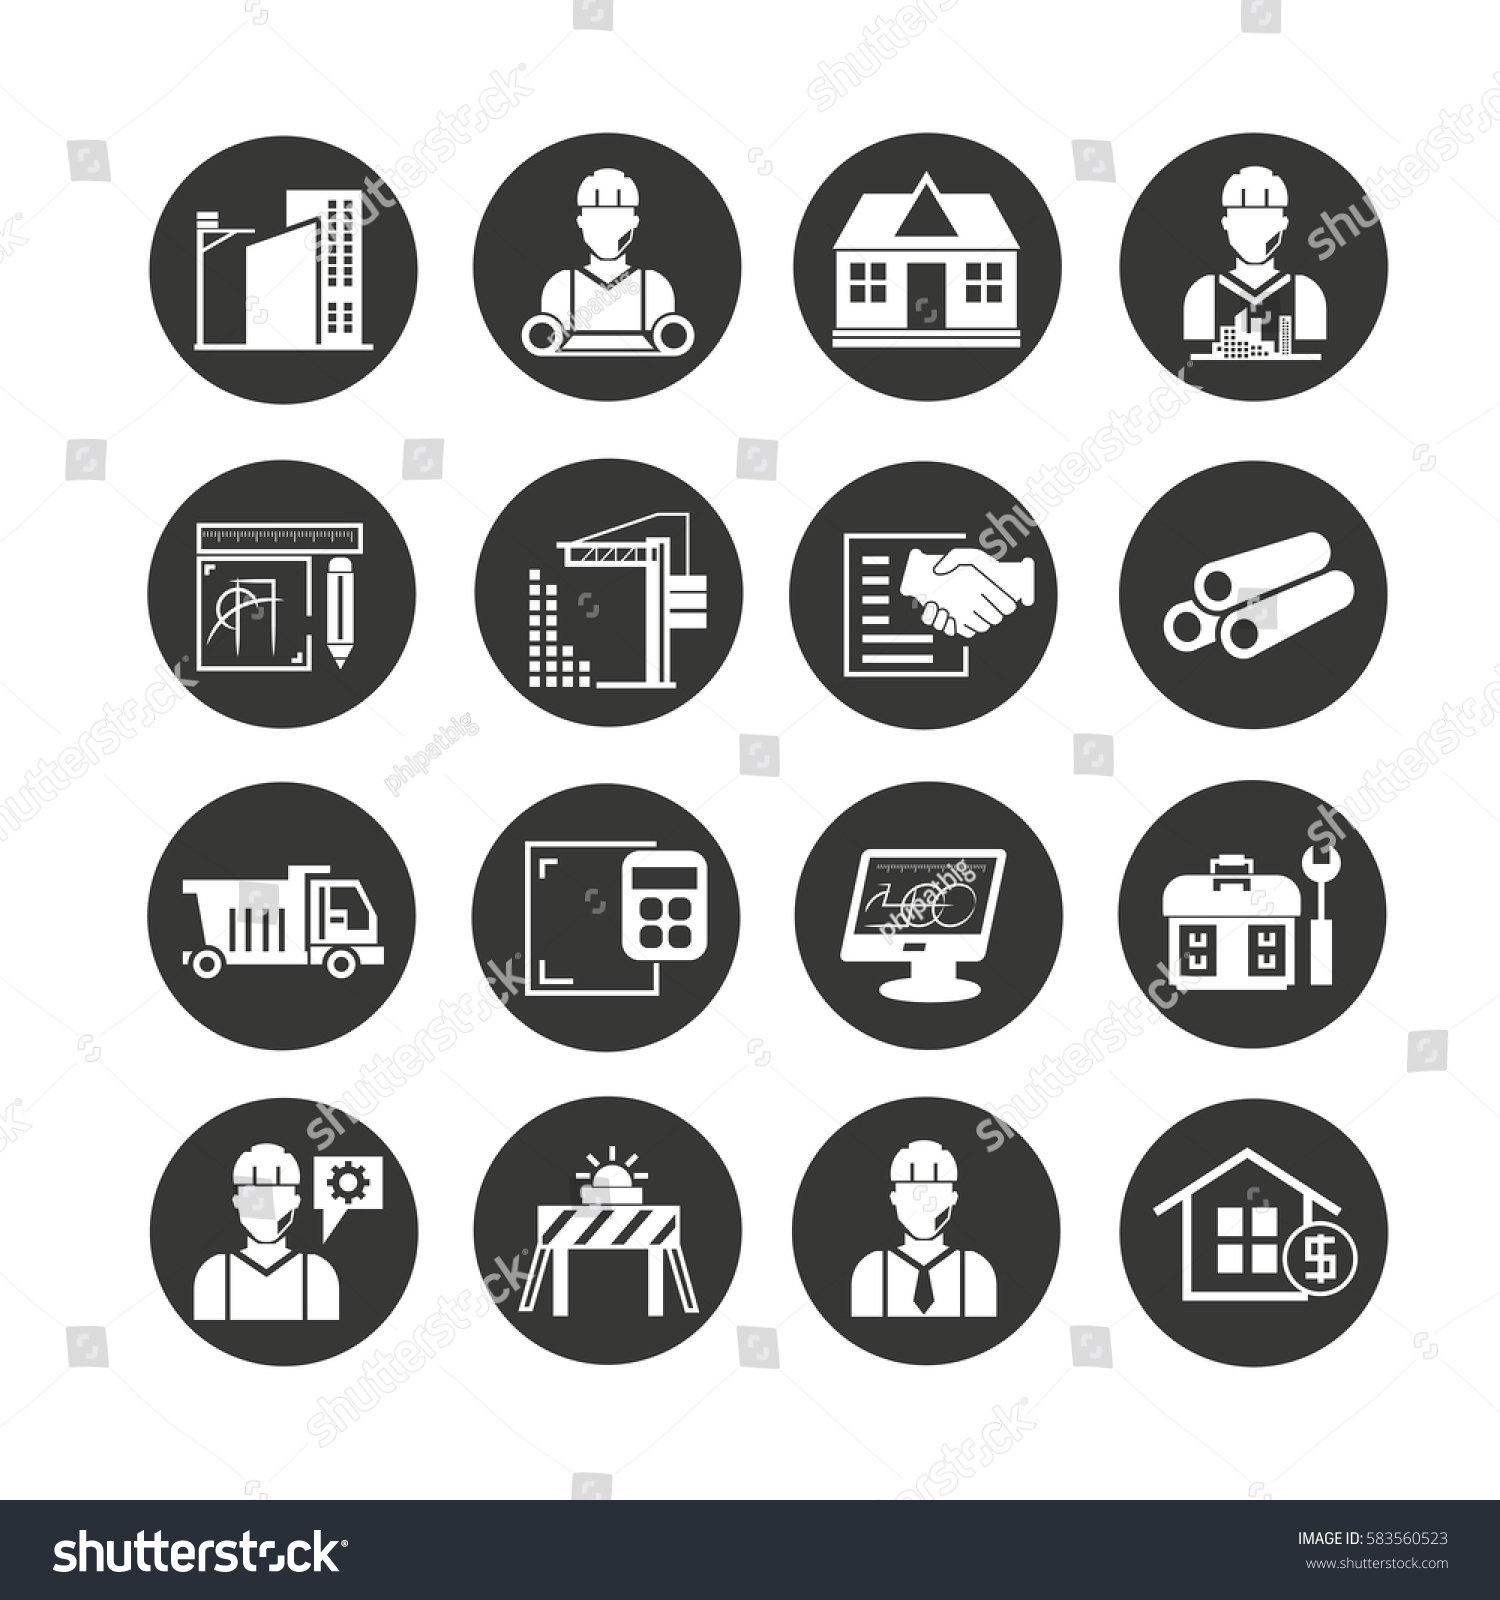 Engineering Plan Set : Engineering construction icon set circle button stock